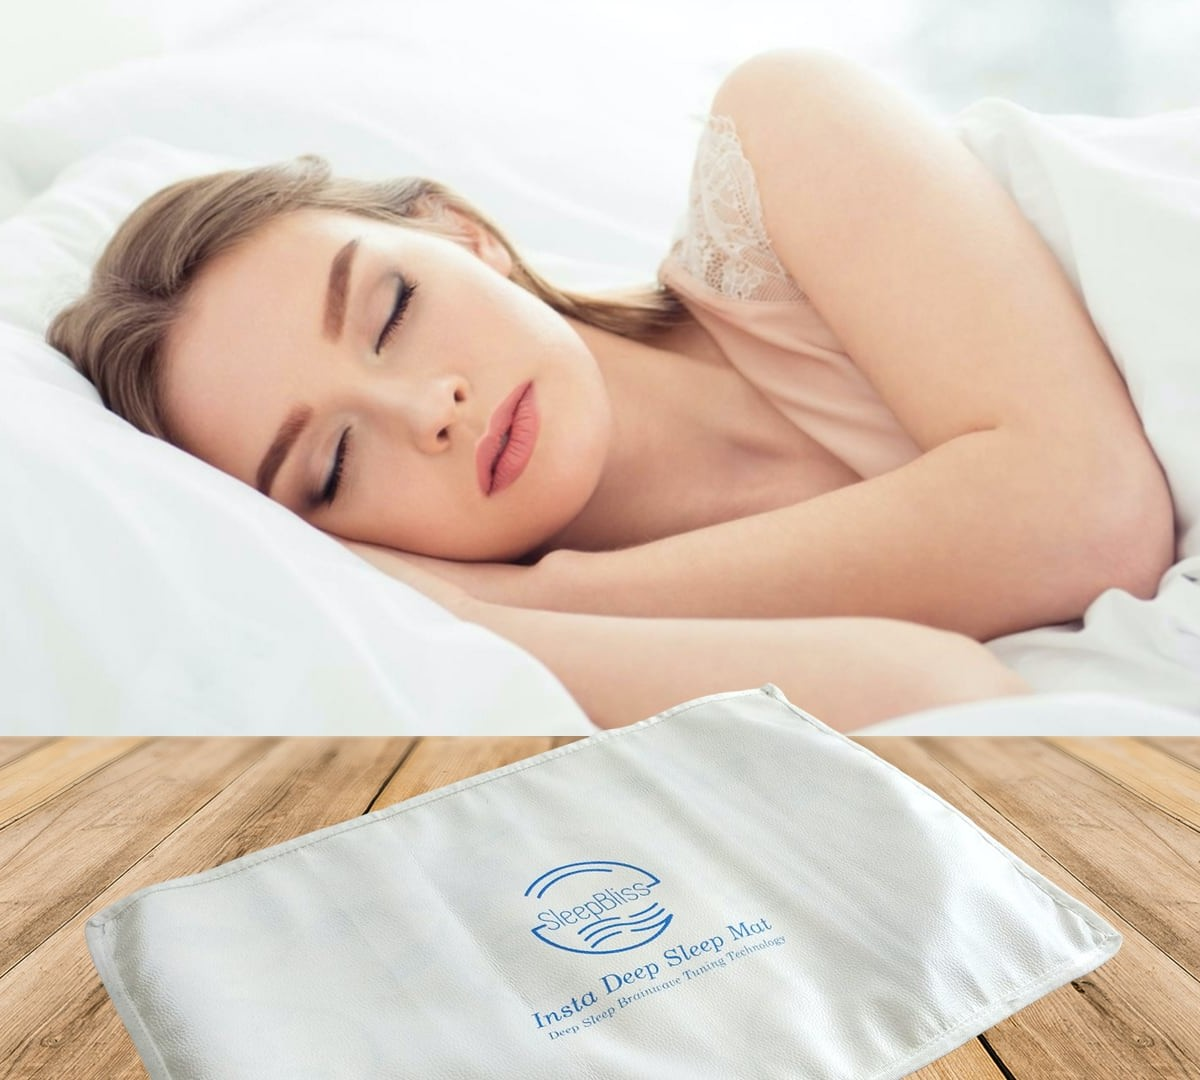 SleepBliss enhances your quality of sleep to provide natural & healthy deep sleep